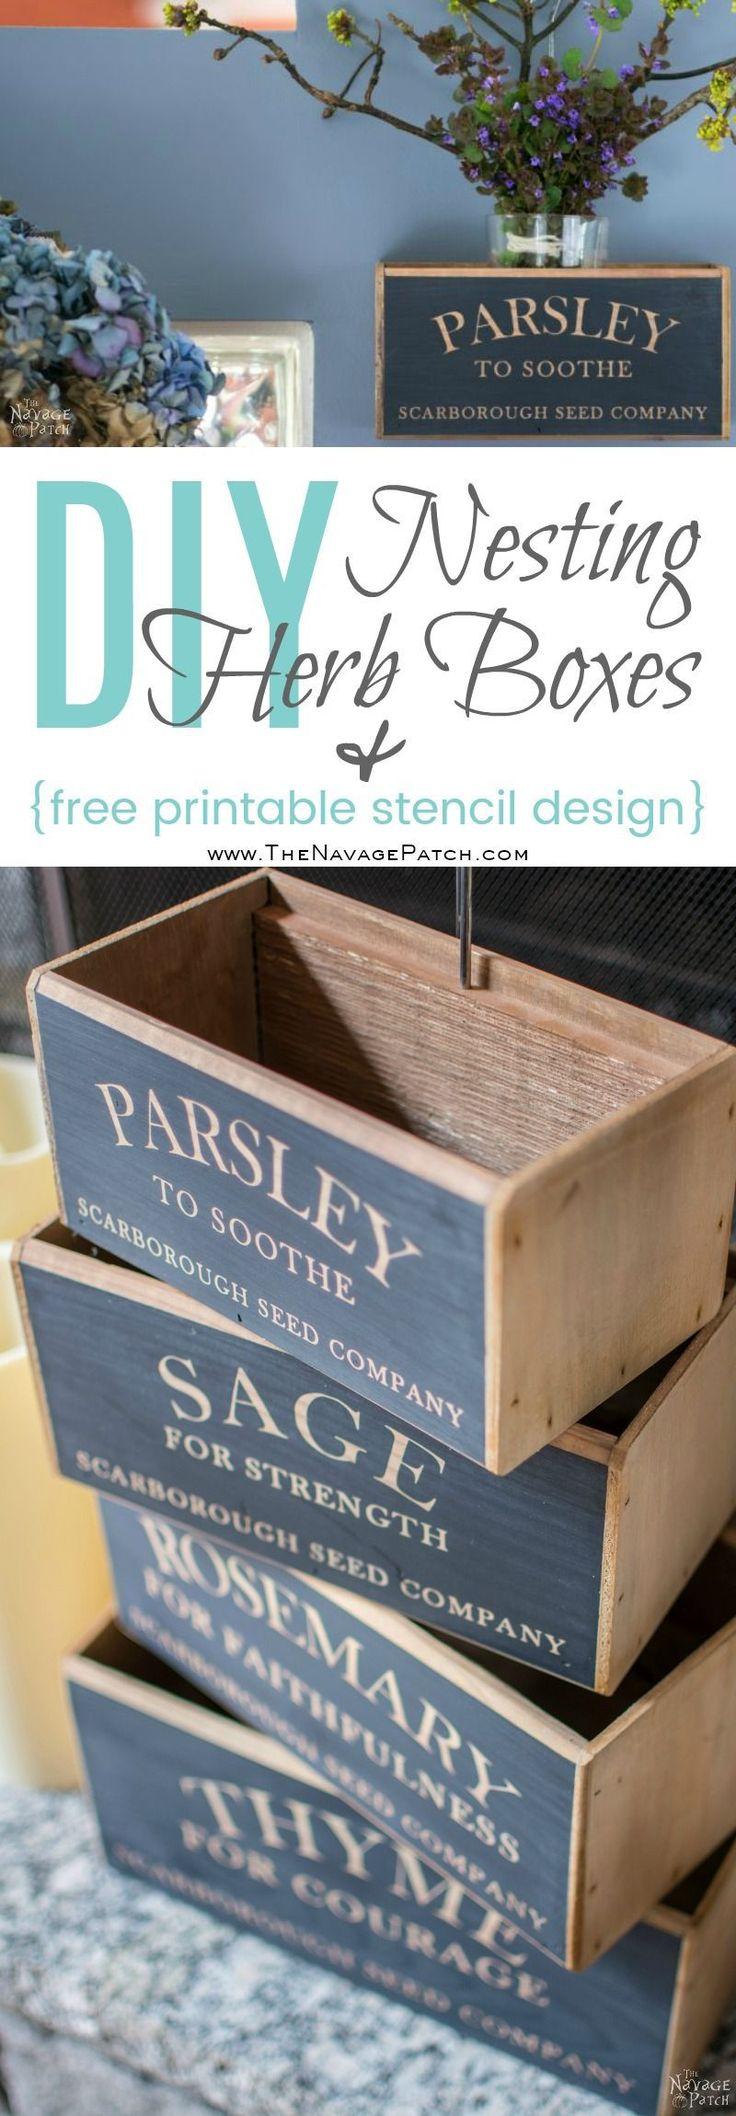 best 25 free stencils ideas on pinterest free printable